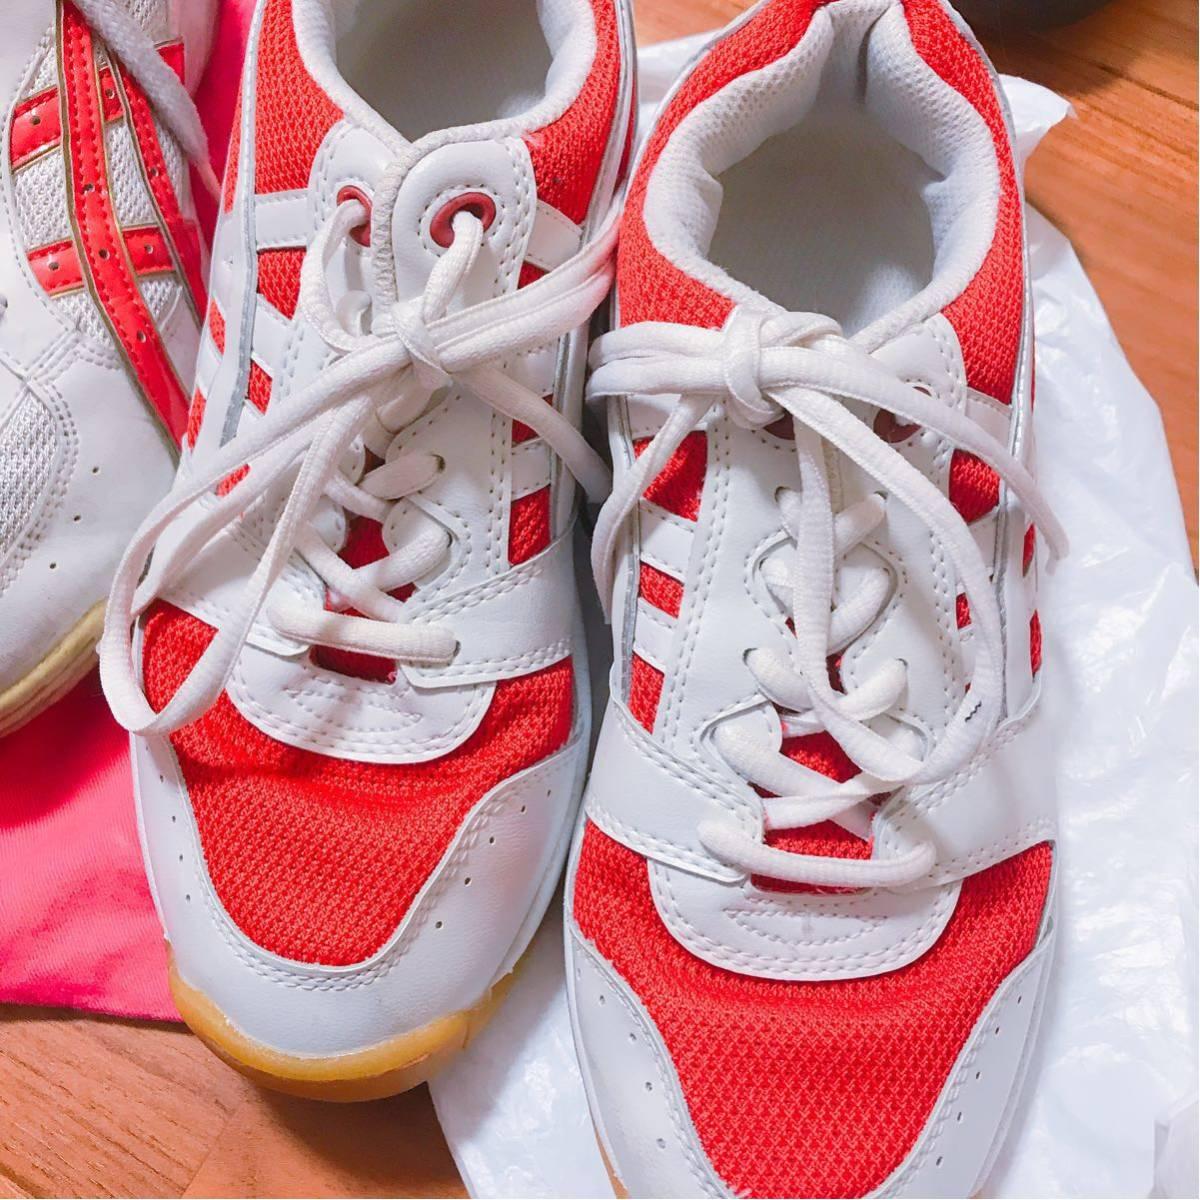 f6dd796a8d 高校生 中学生 運動靴 体育館シューズ 体育履き 運動シューズ ランニングシューズ 体育 asics 女子高生